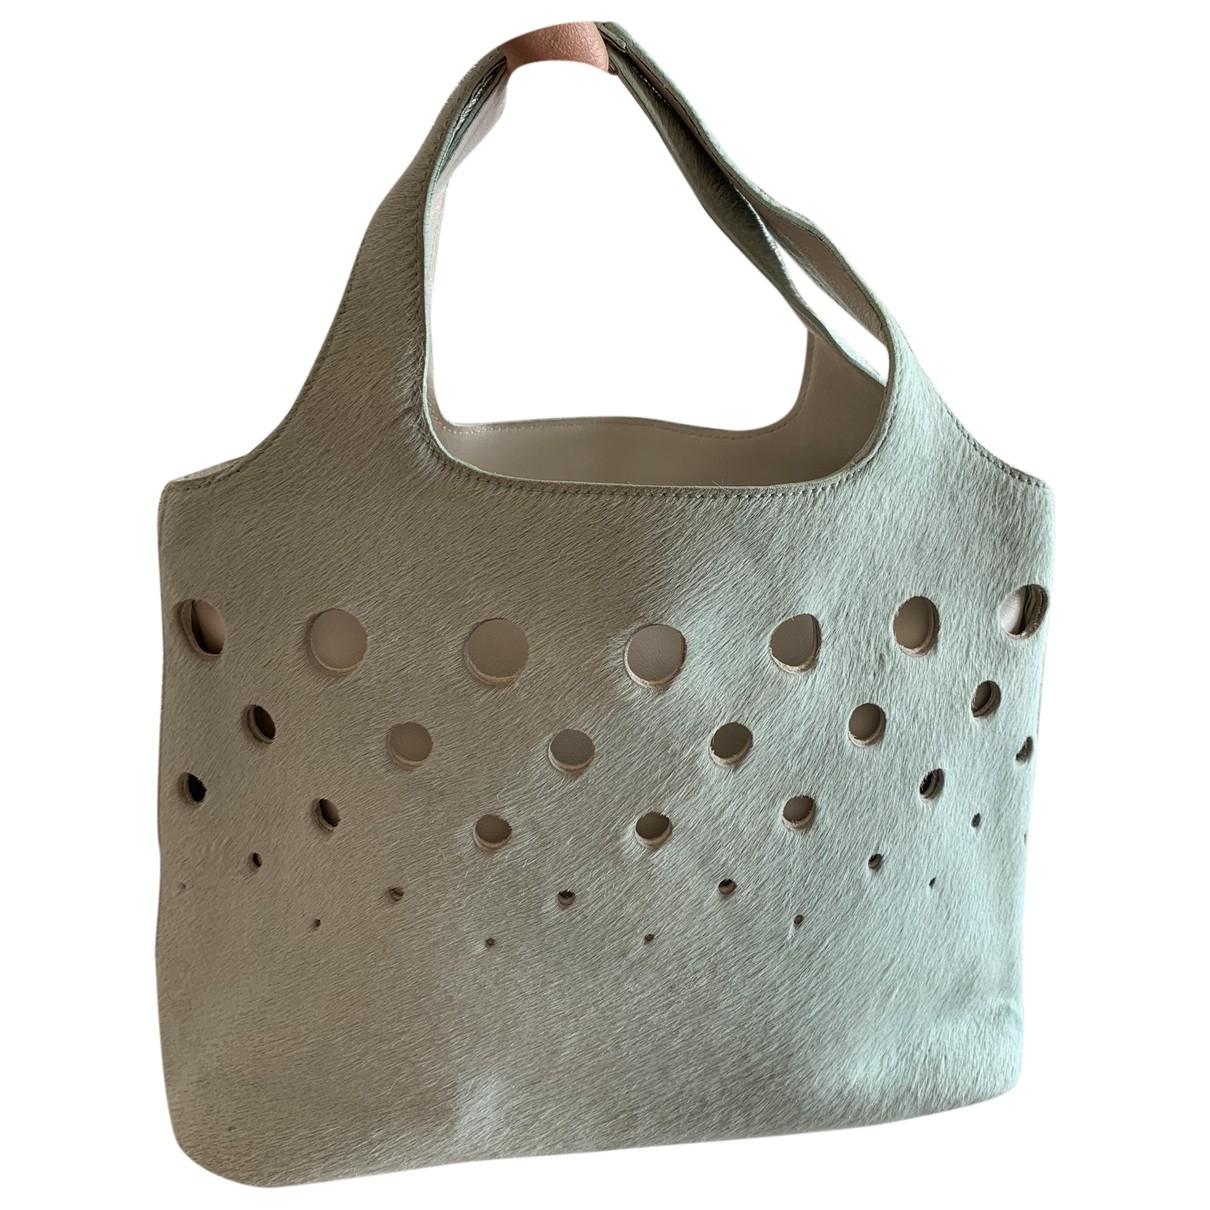 Salvatore Ferragamo \N Green Pony-style calfskin handbag for Women \N